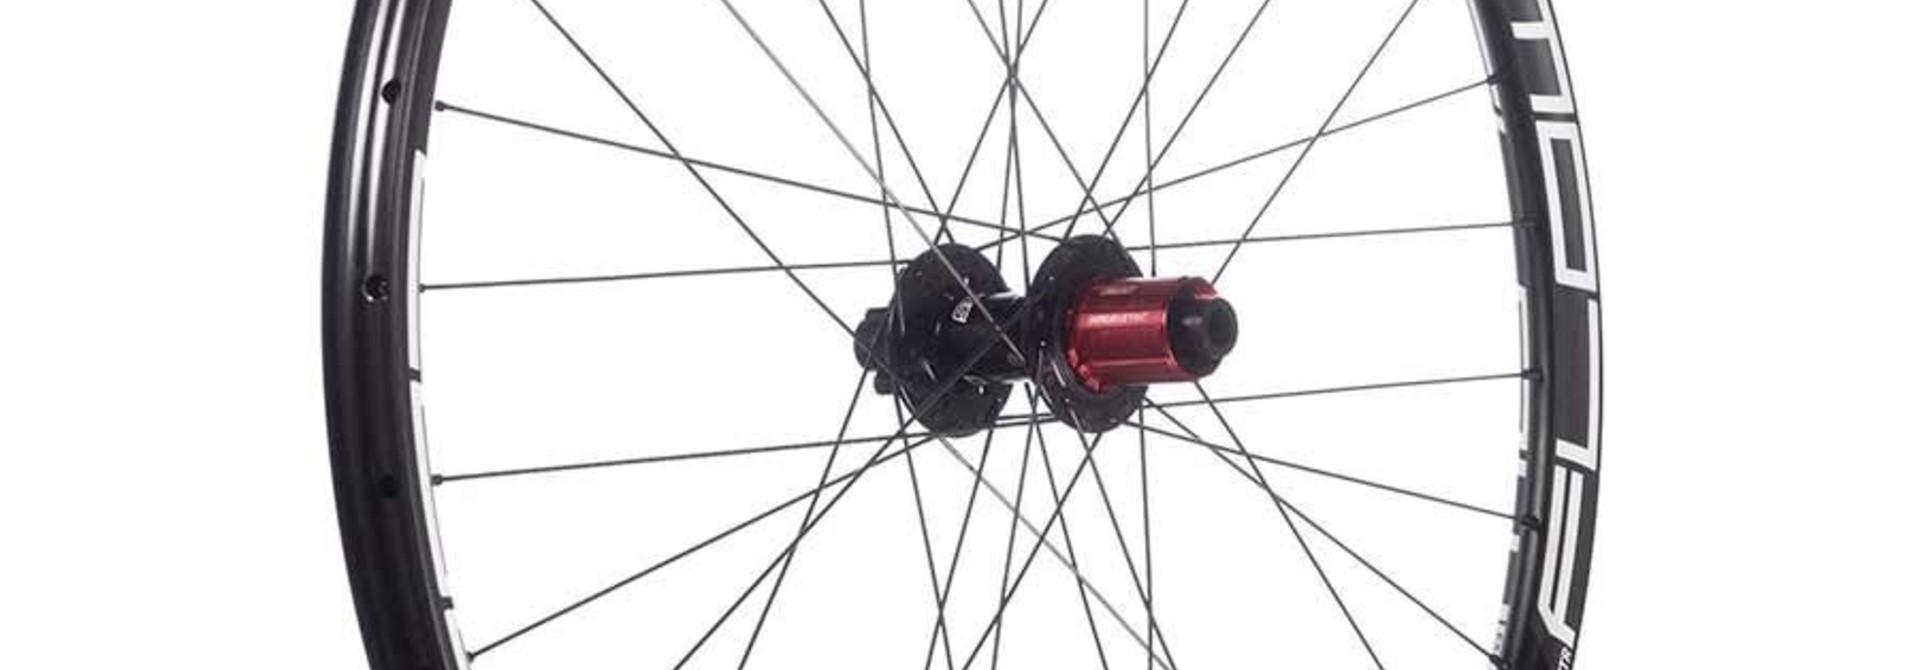 Stans No Tubes, Flow EX3, Wheel, Rear, 29'' / 622, Holes: 32, 12mm TA, 148mm, Disc IS 6-bolt, SRAM XD